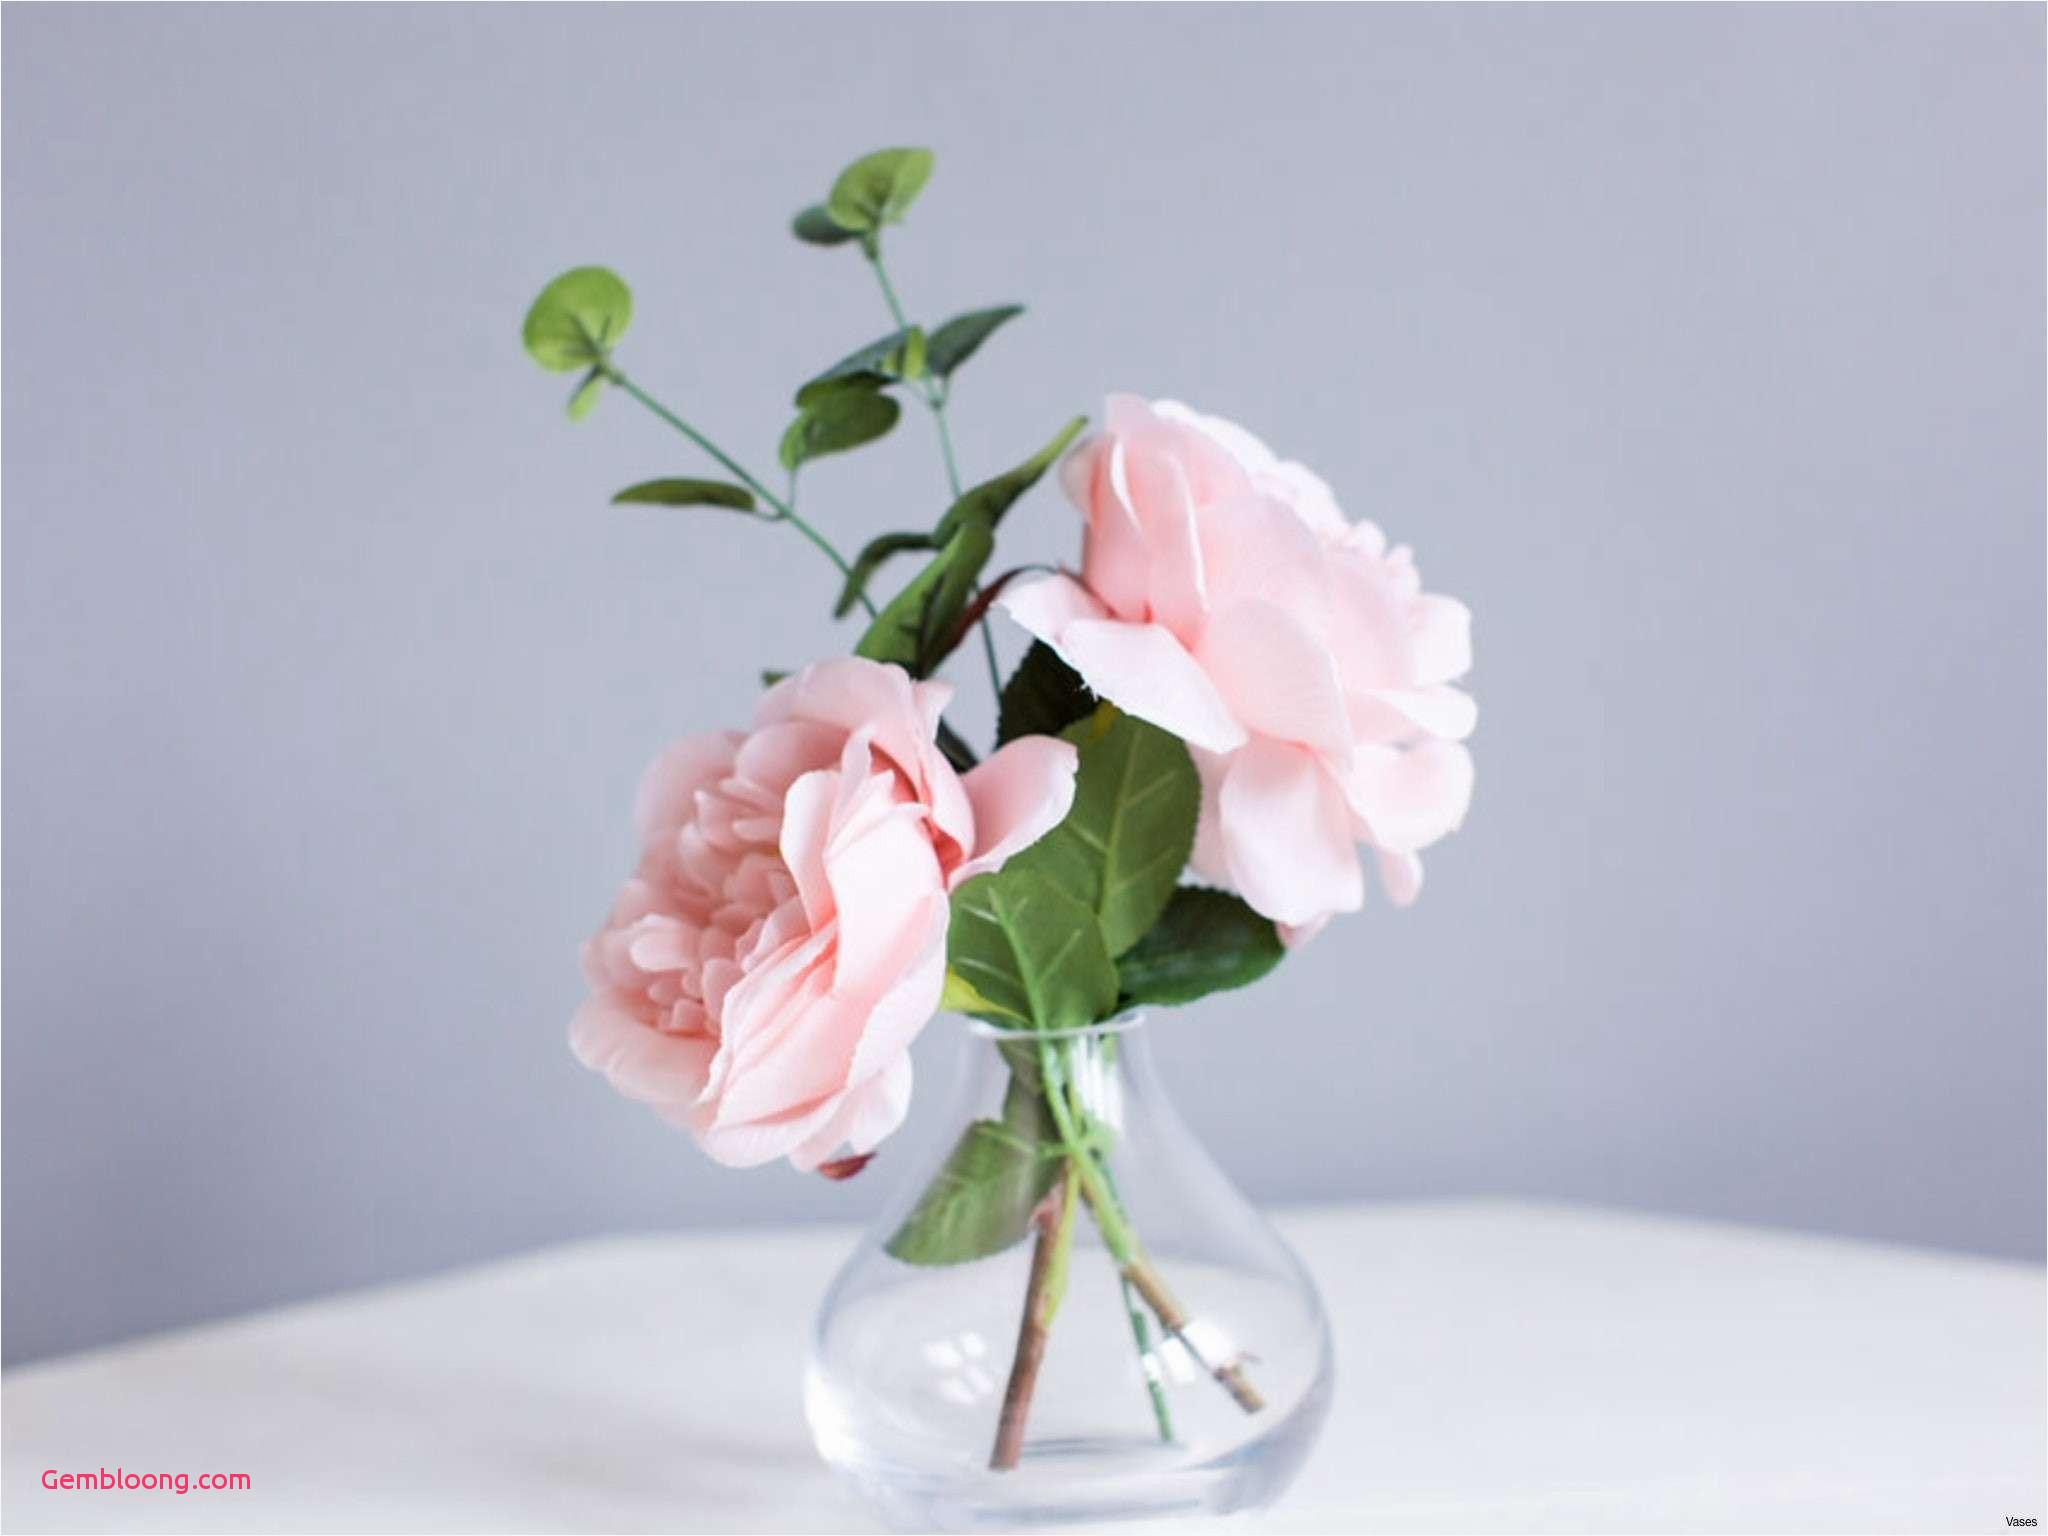 rustic flower vase of elegant modern white flower vase bogekompresorturkiye com within h vases bud vase flower arrangements i 0d for inspiration design inspiration flower arrangement